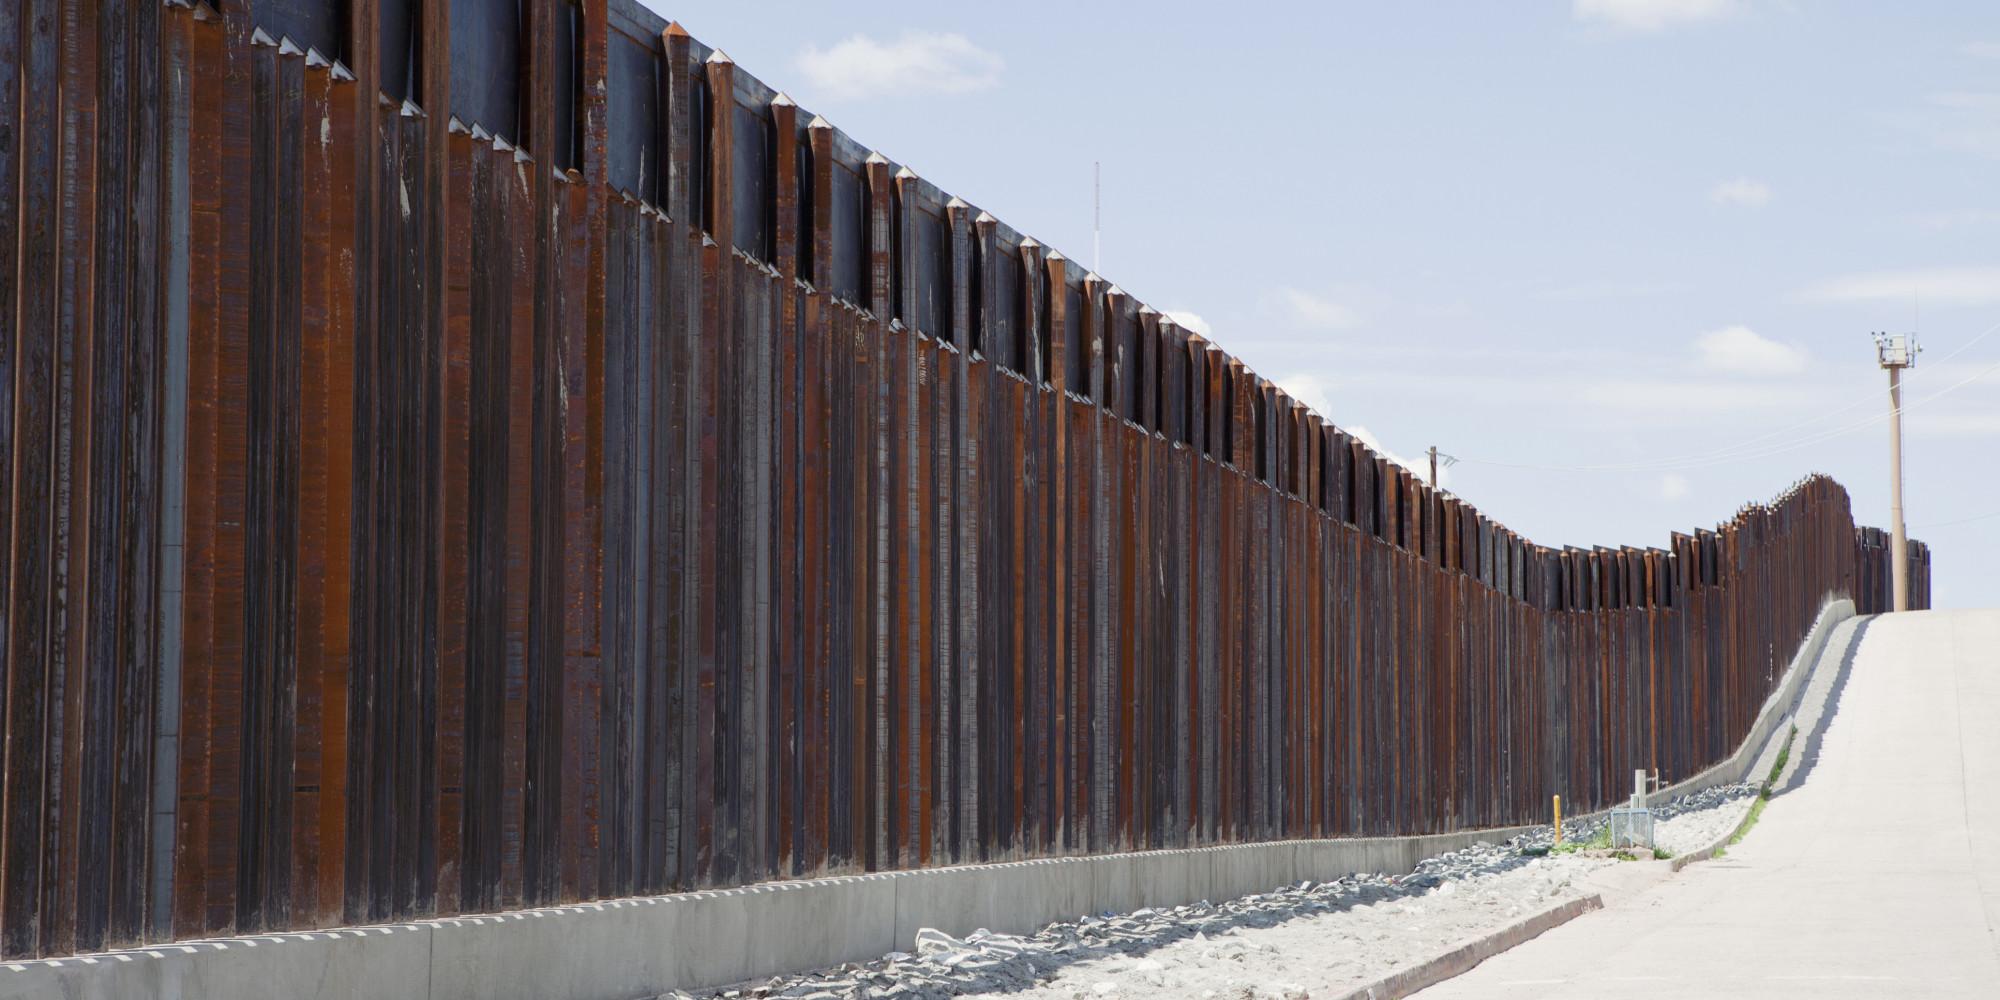 ... ... : Republicans Embrace Building of BORDER WALL, Despite Cost